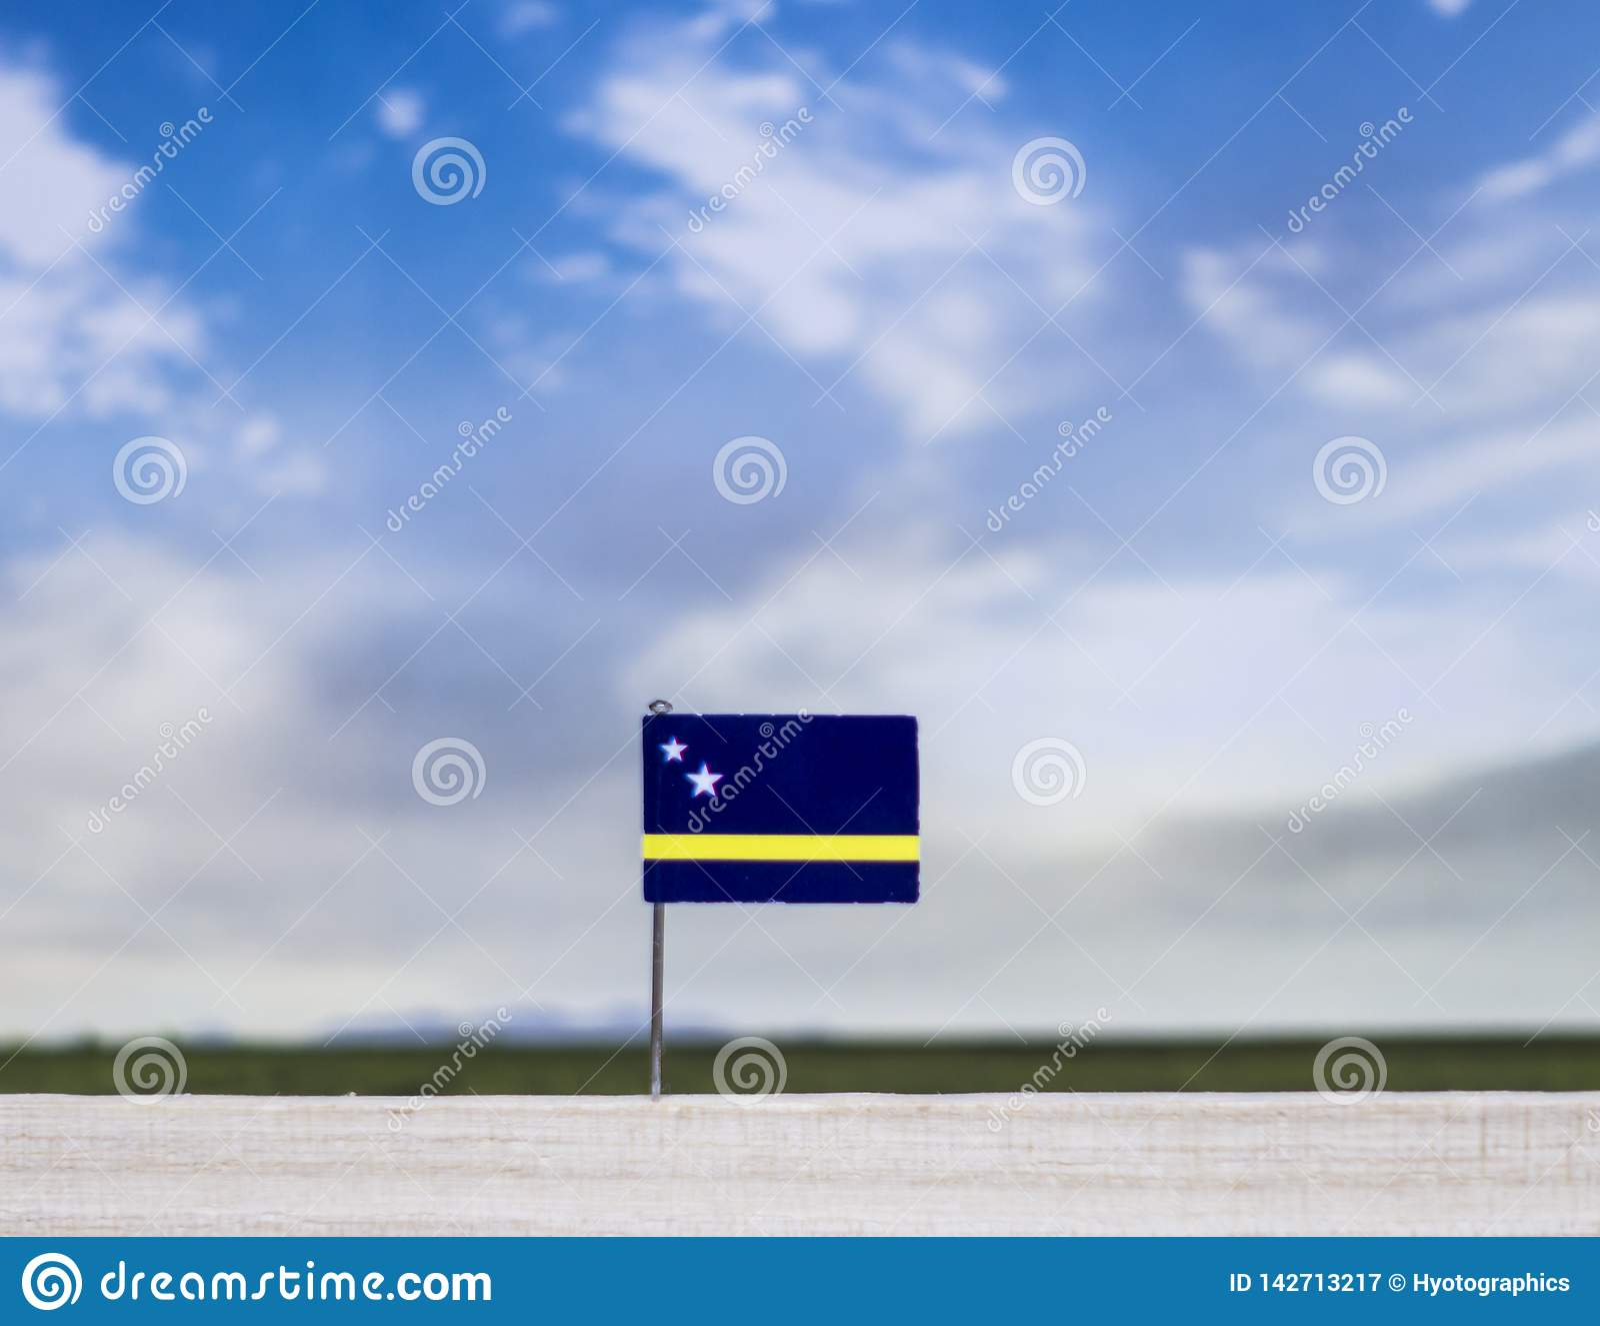 Vlag van Curacao met enorme weide en blauwe hemel achter het